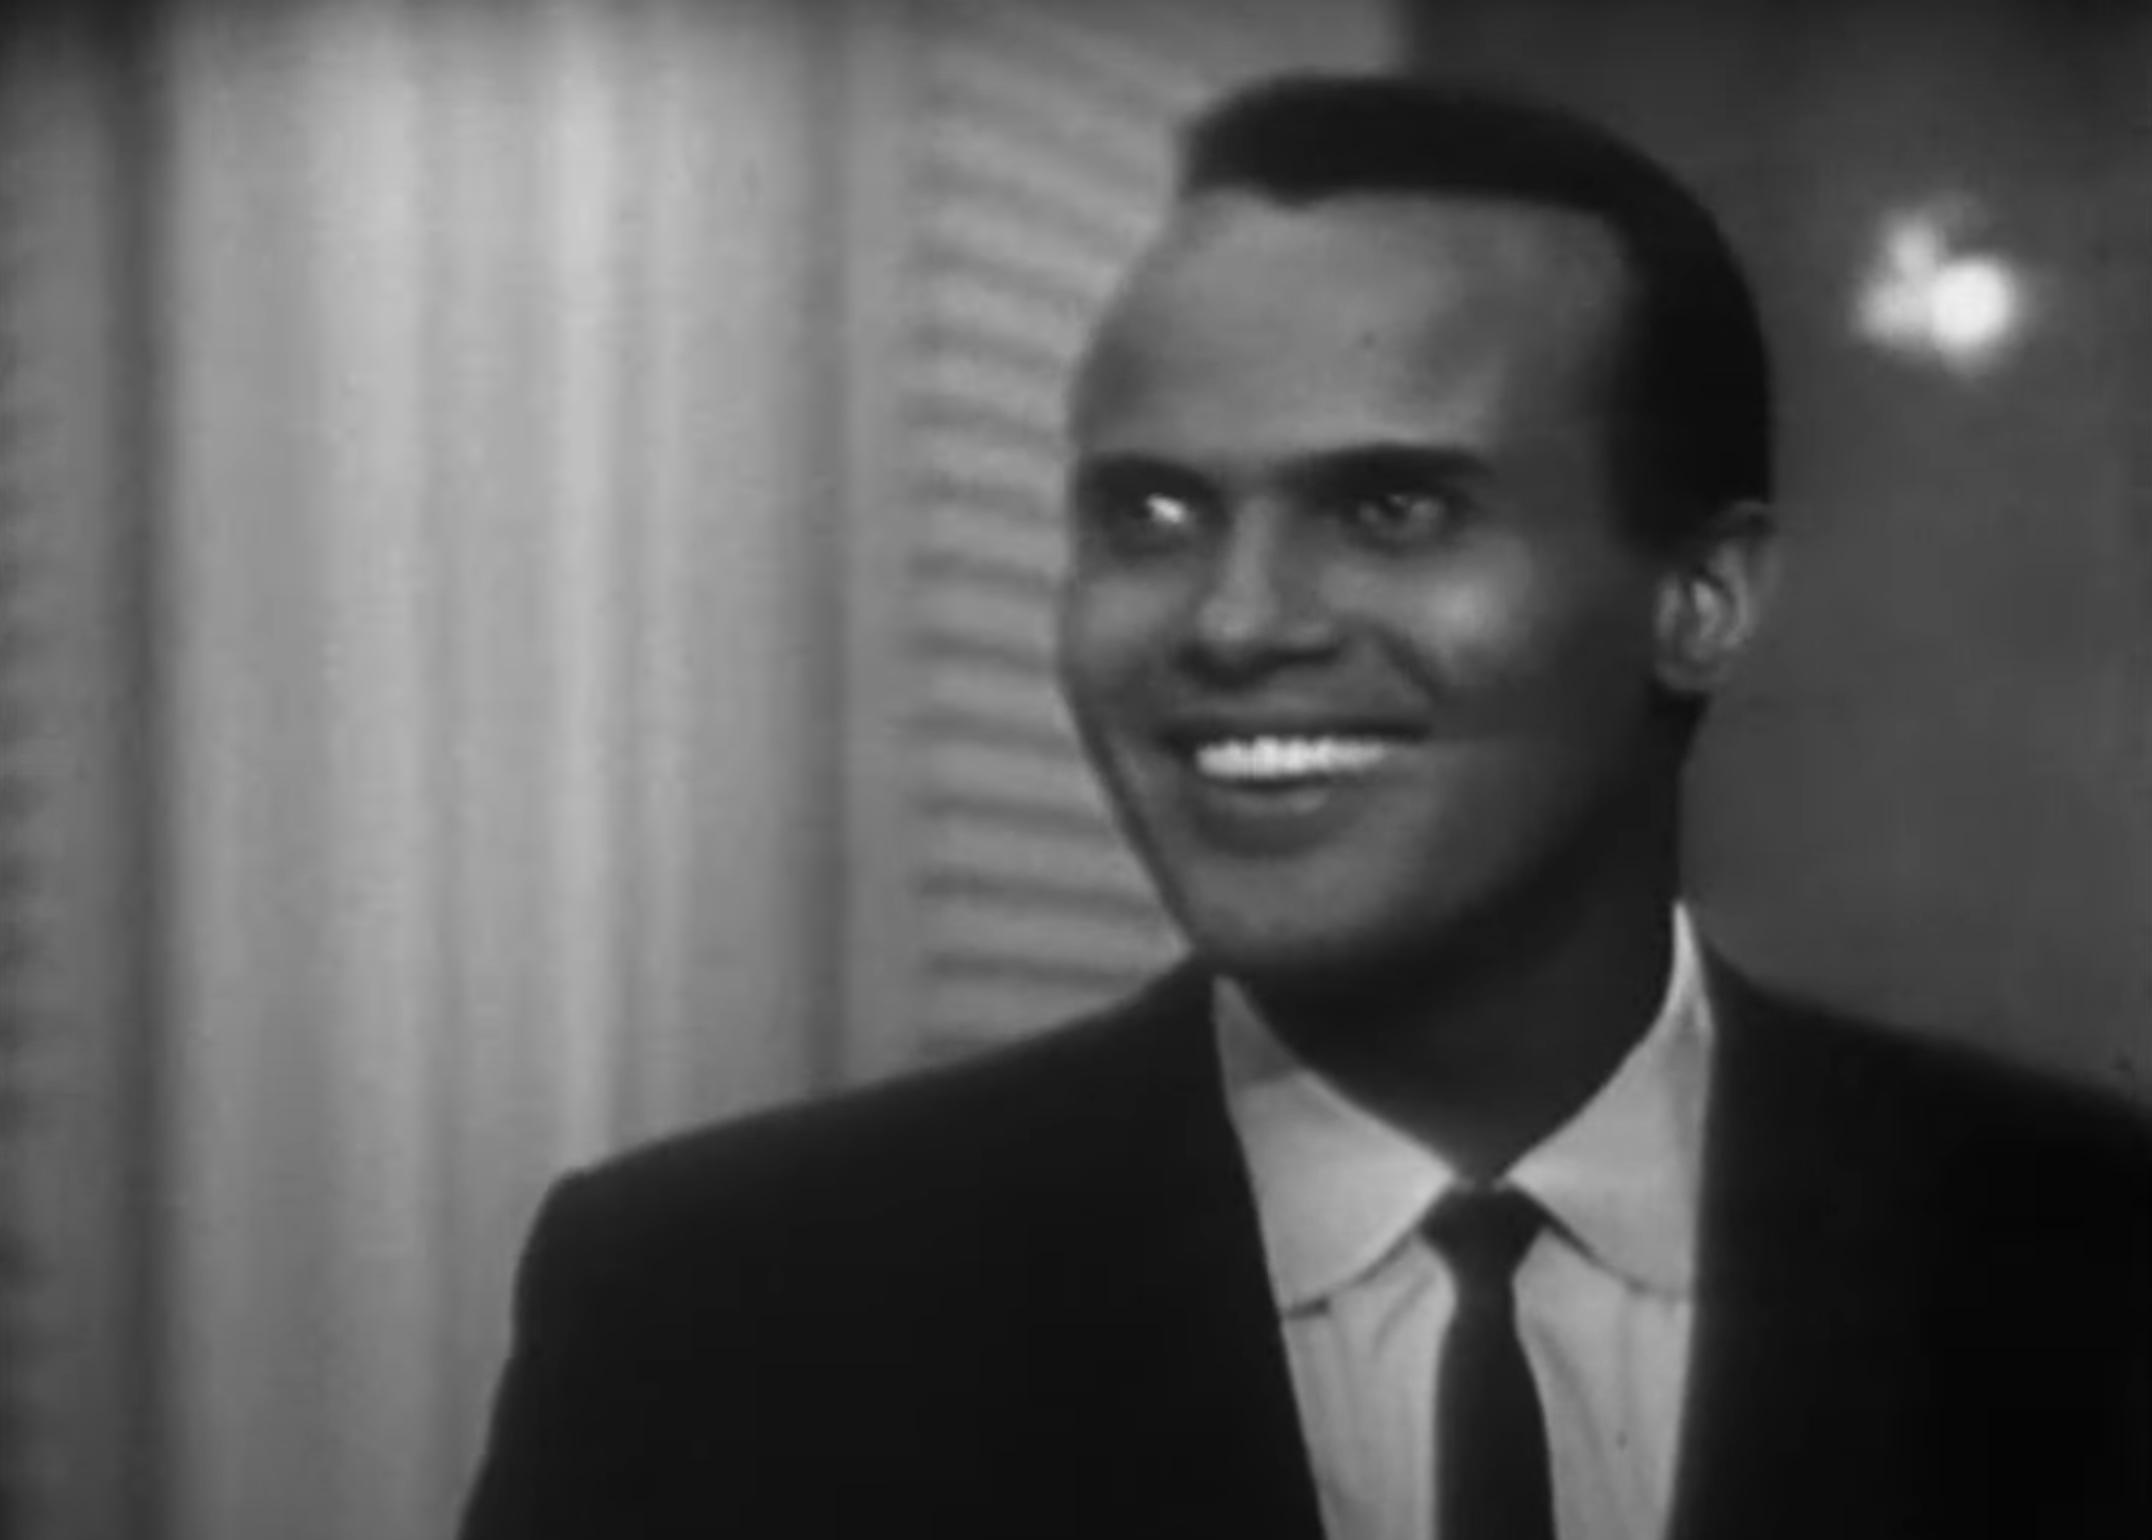 Harry Belafonte smiling